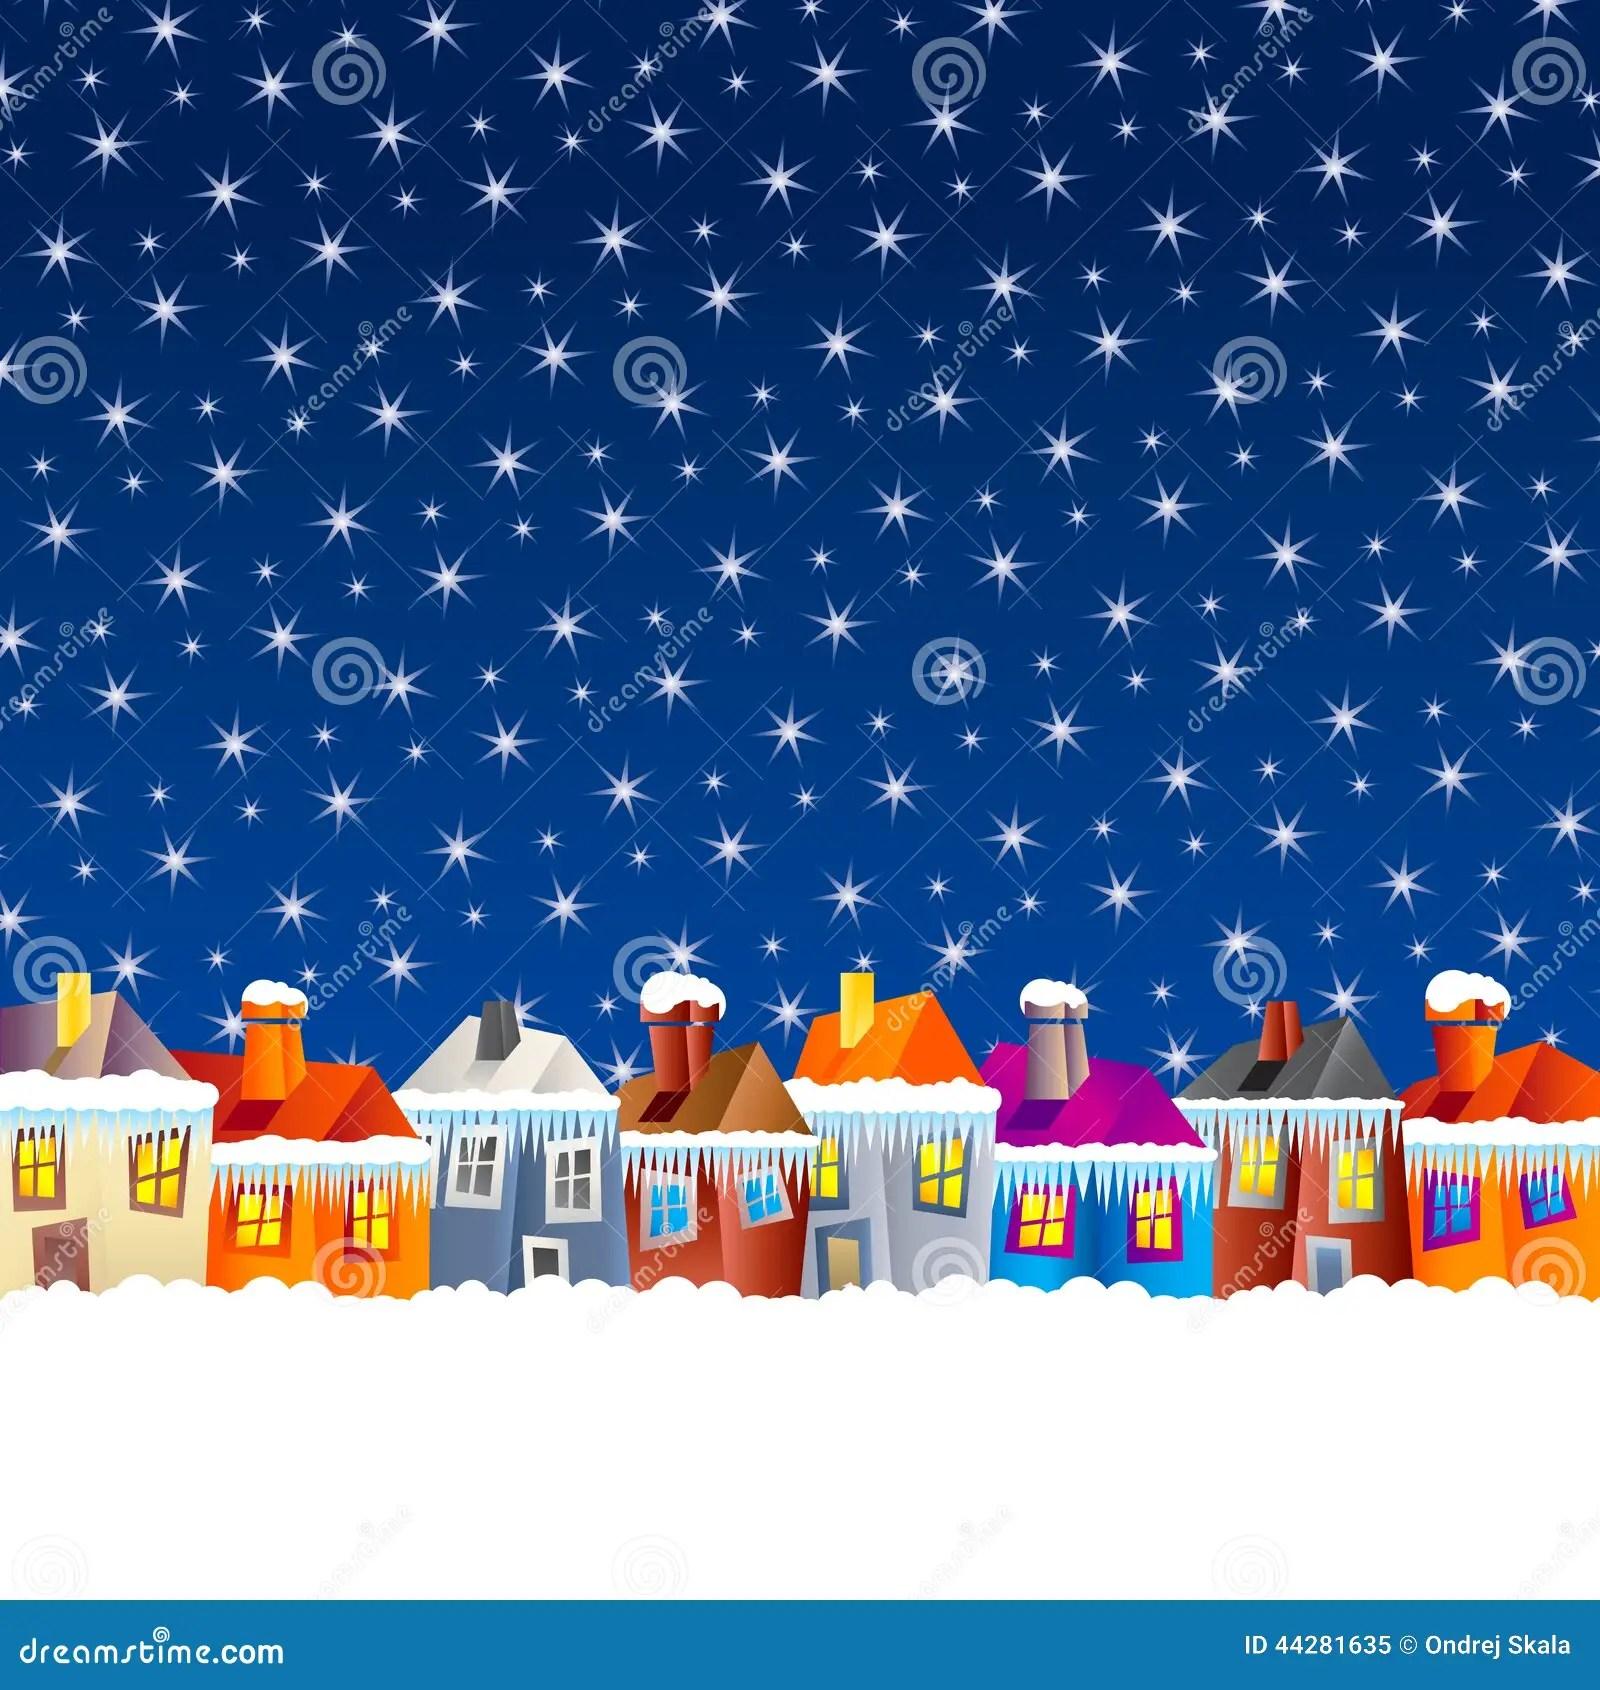 Cartoon Village Houses In Winter Stock Vector  Image